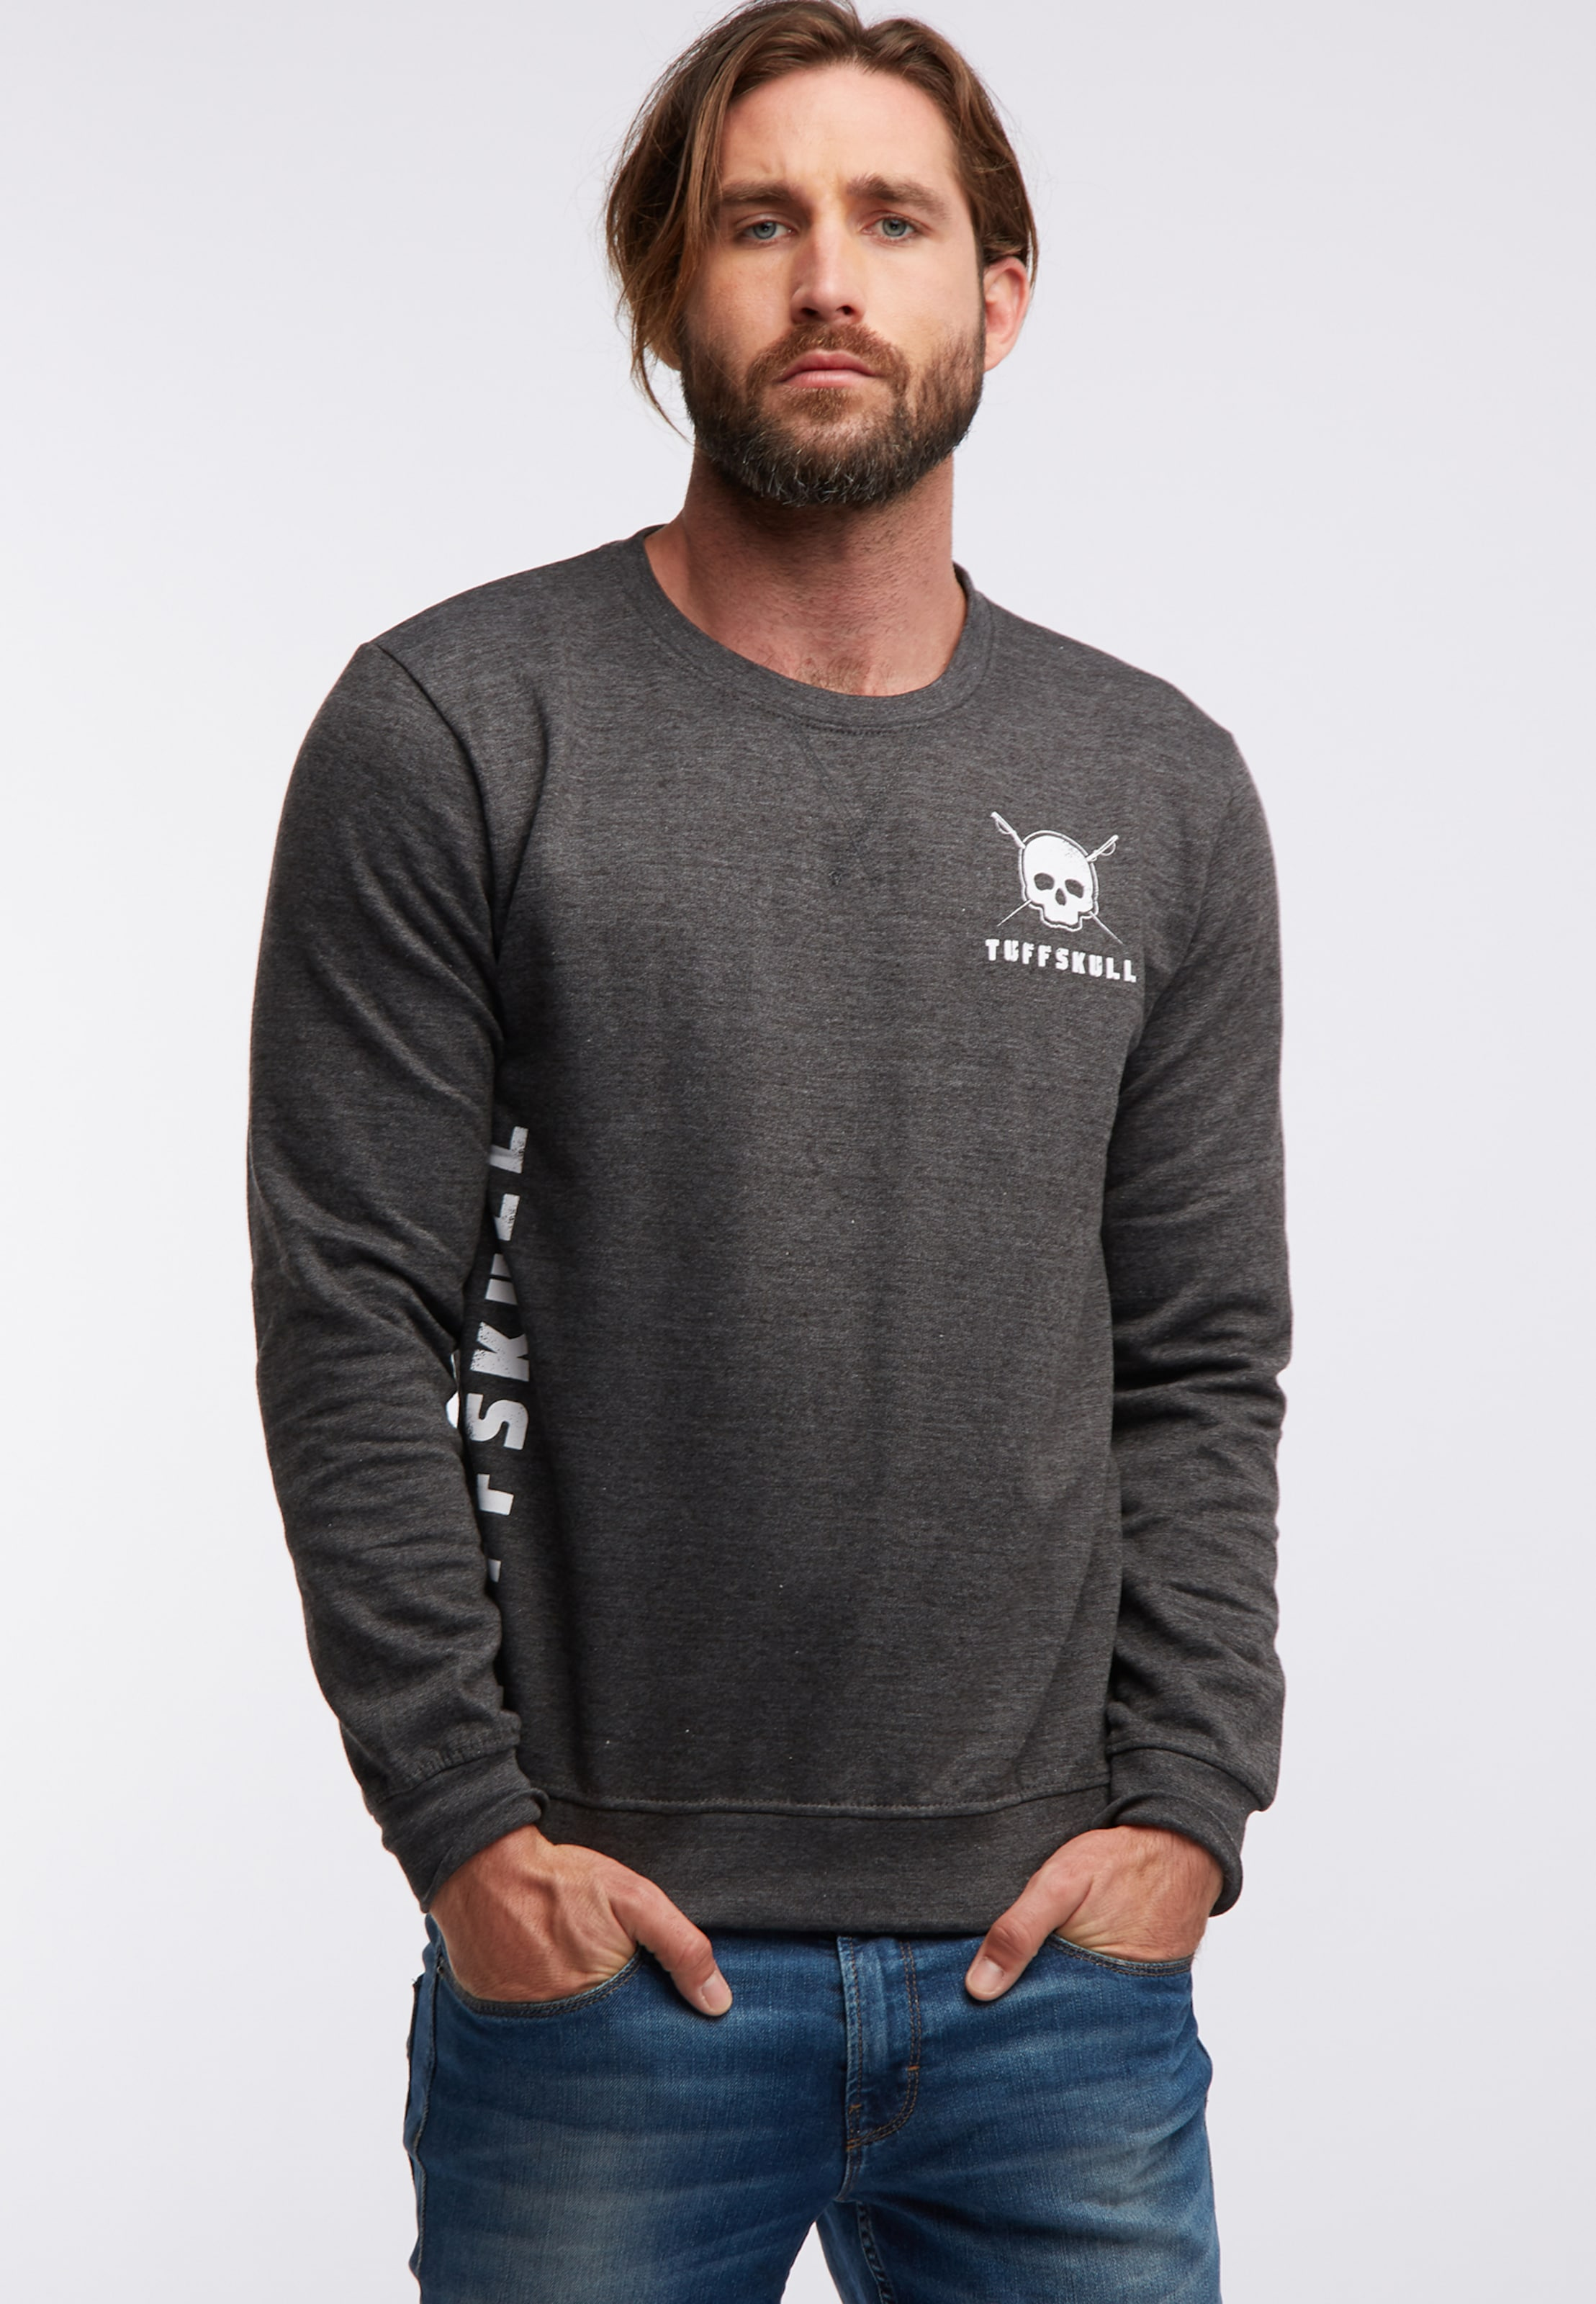 Sweatshirt Tuffskull Tuffskull DunkelgrauWeiß DunkelgrauWeiß Sweatshirt In In Tuffskull YIeWH29EDb